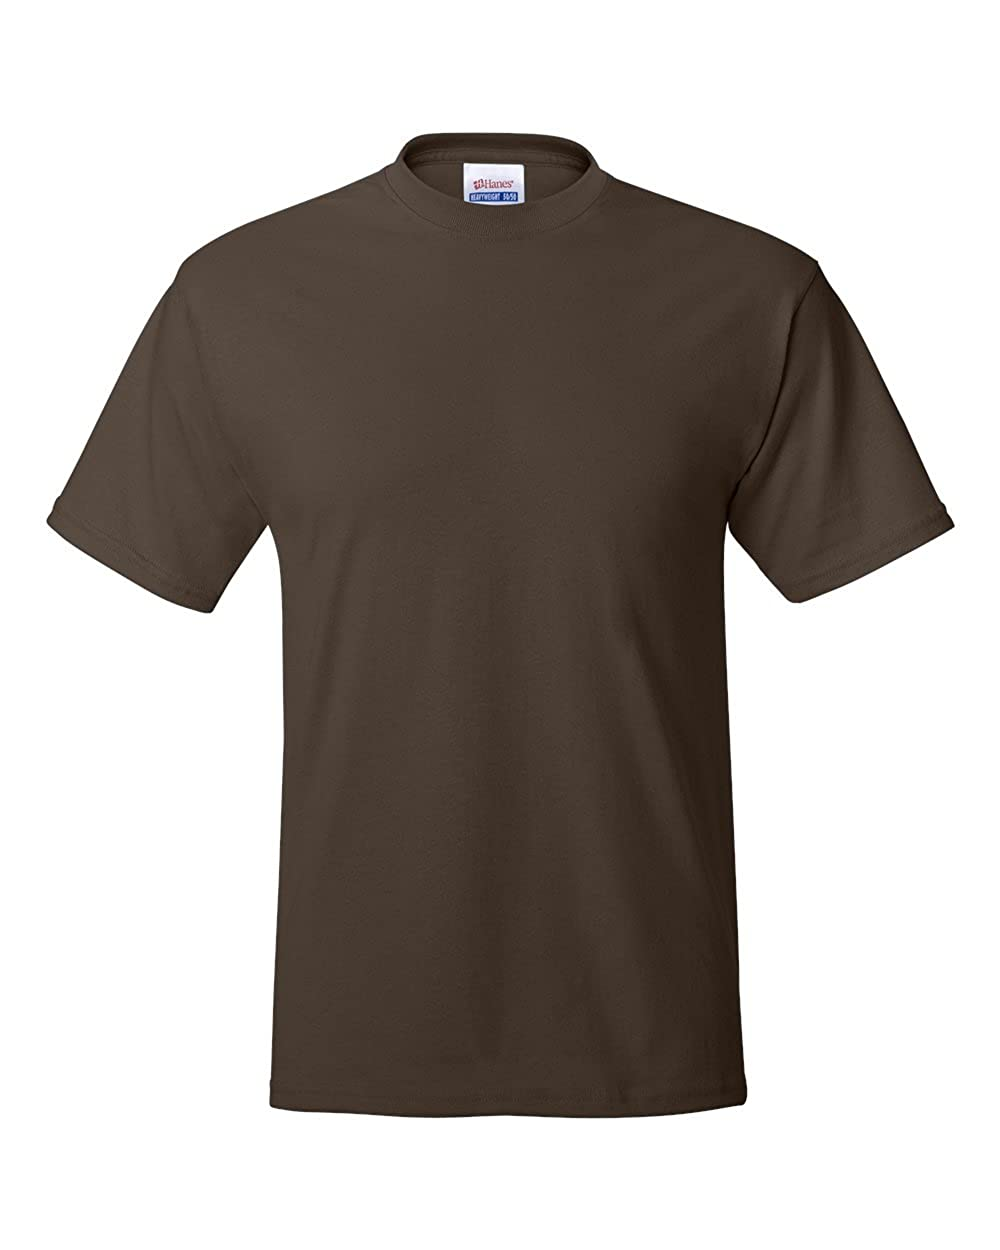 DARK CHOCOLATE 2XL - Hanes 52 oz 50//50 EcoSmart T-Shirt Style # 5170 - Original Label